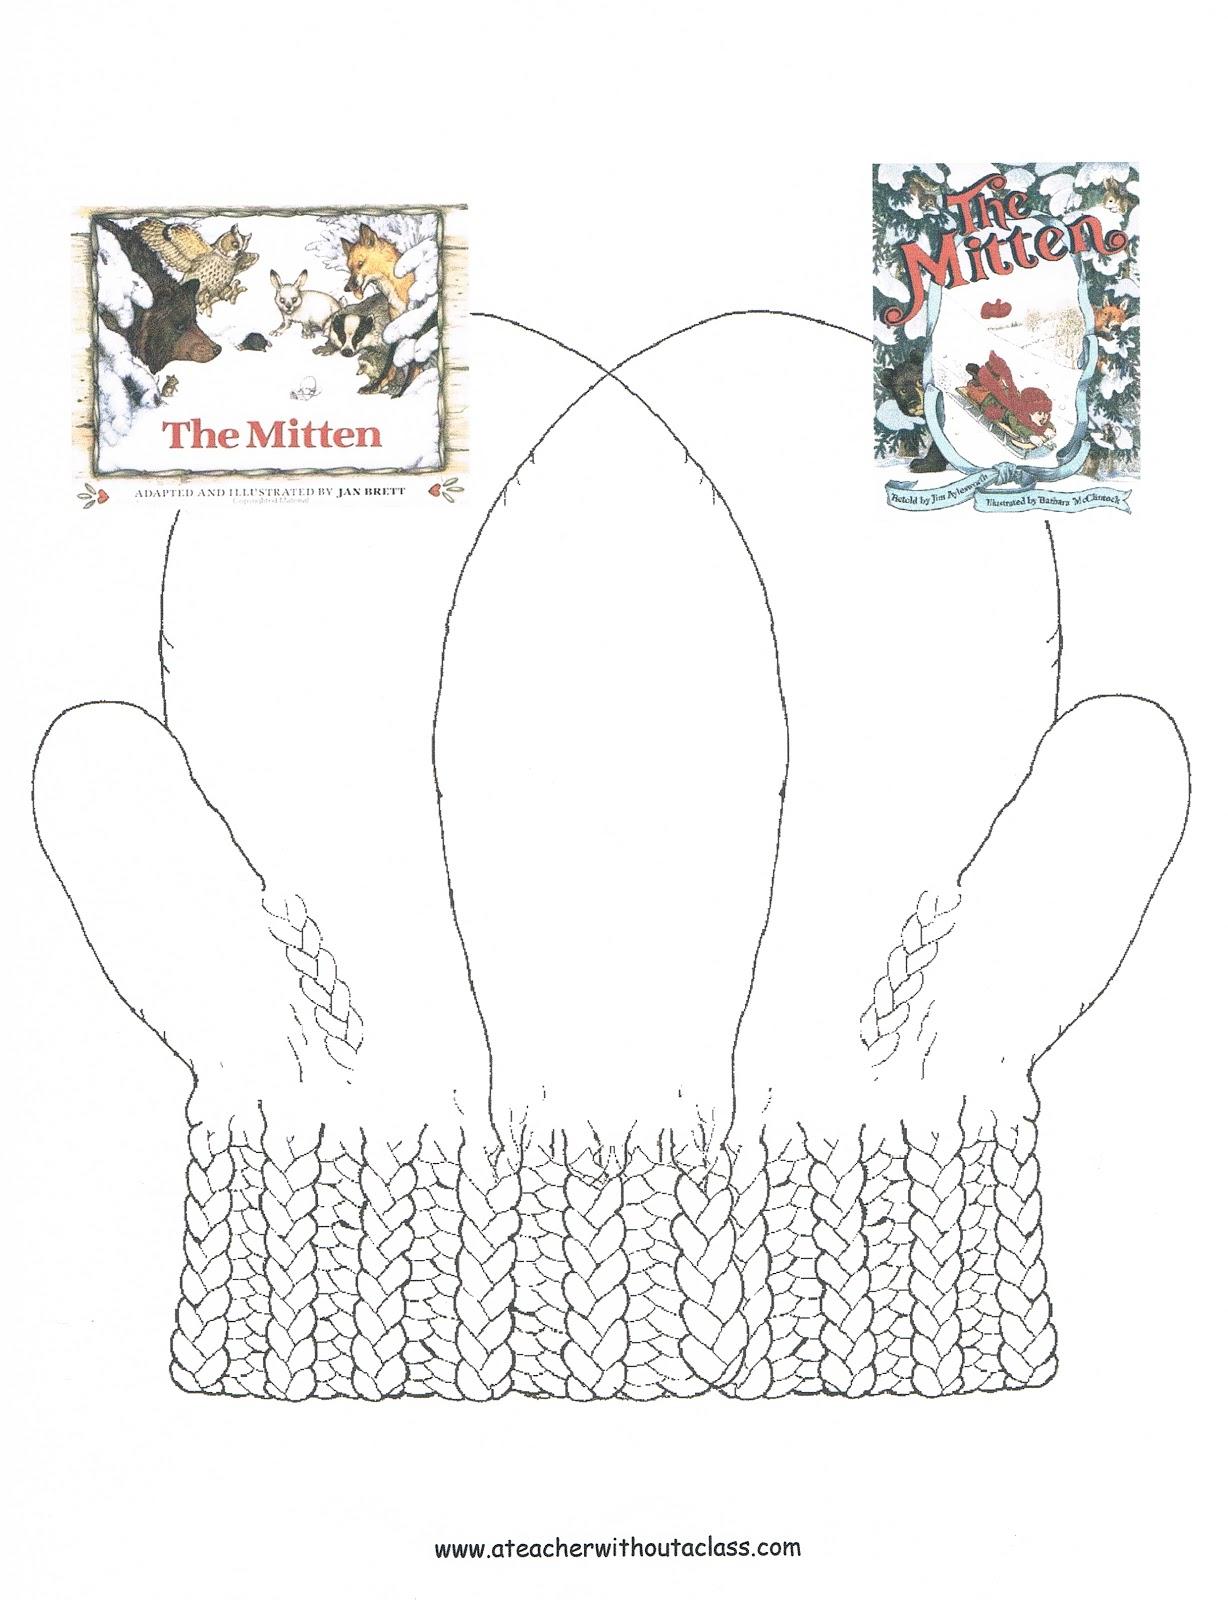 ... from the mitten by jan brett white mitten for jan brett s the mitten